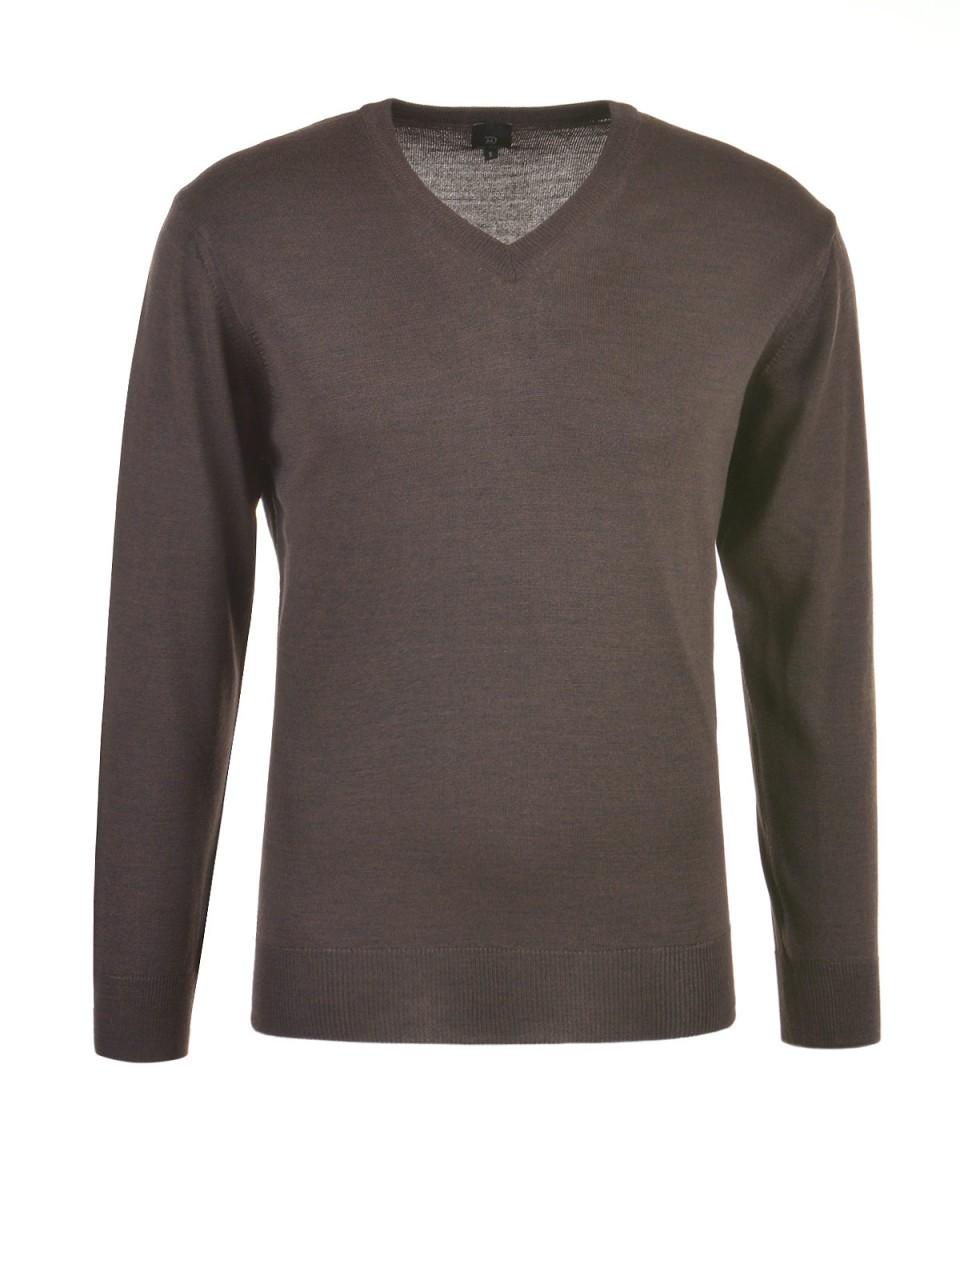 milano-italy-herren-pullover-braun